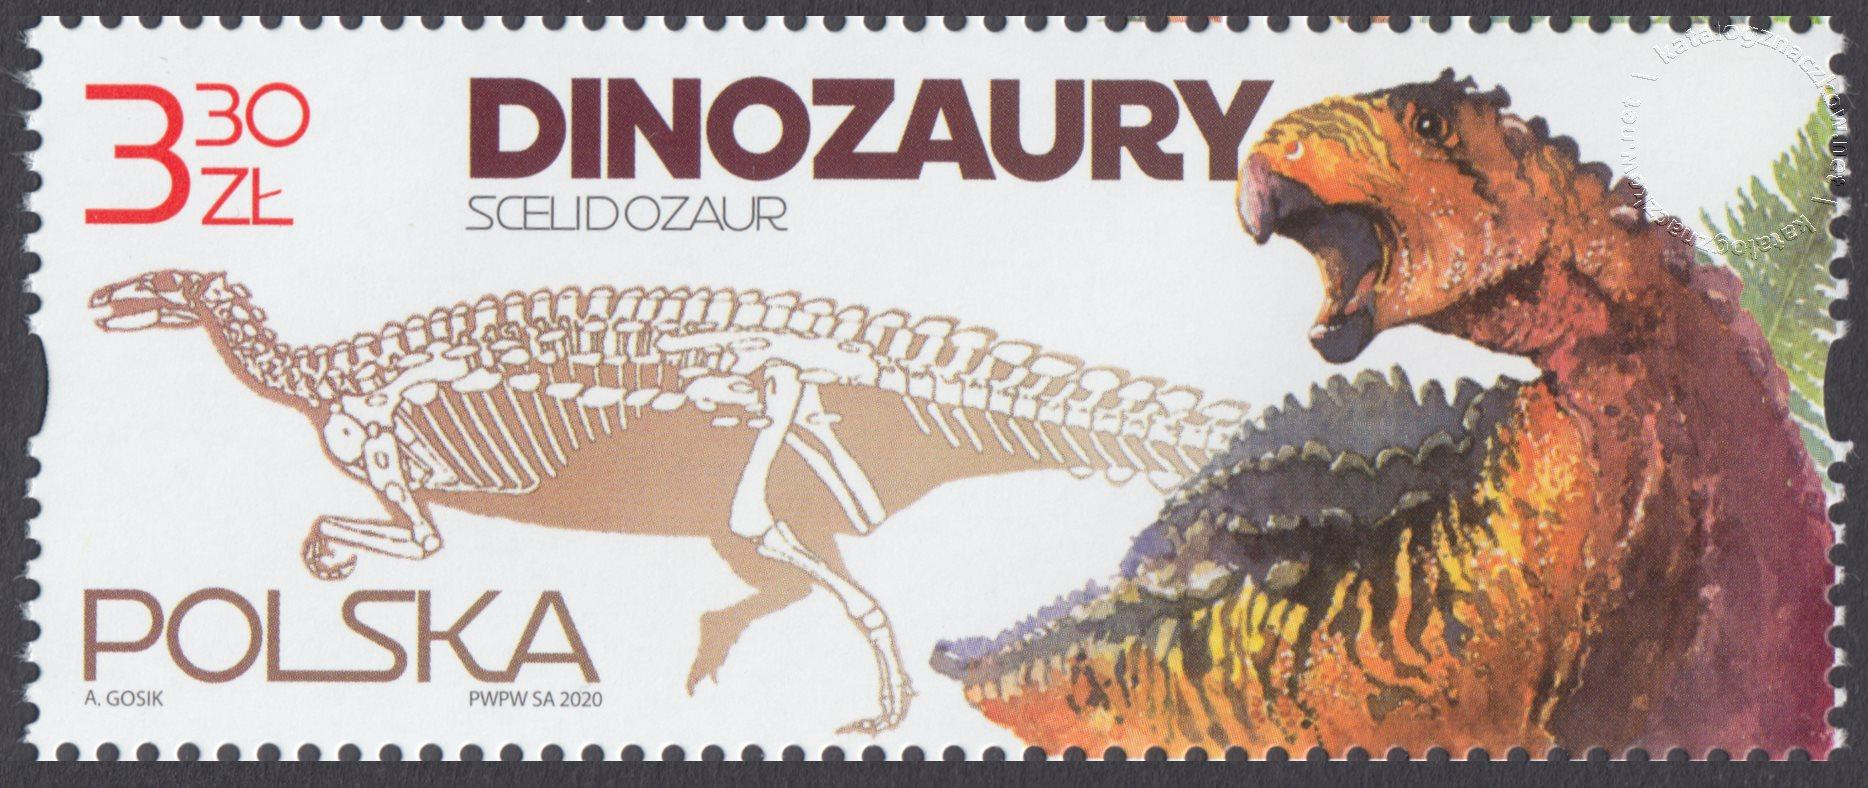 Dinozaury znaczek nr 5110